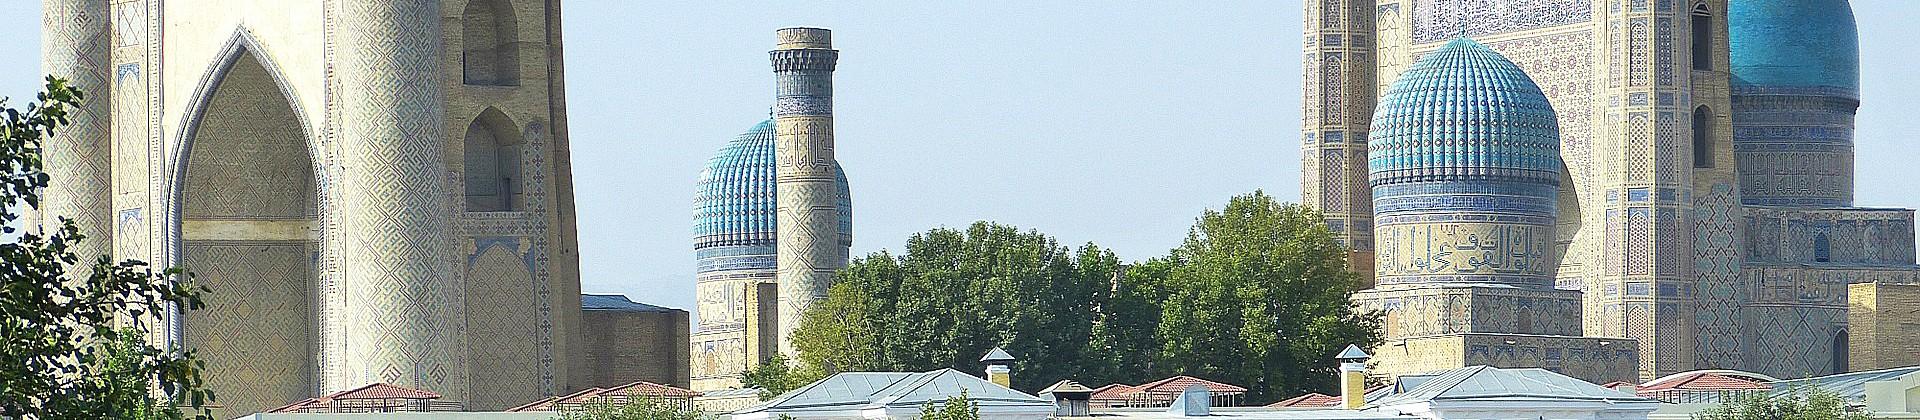 Uzbekistan 6 days Tour from Istanbul - 1